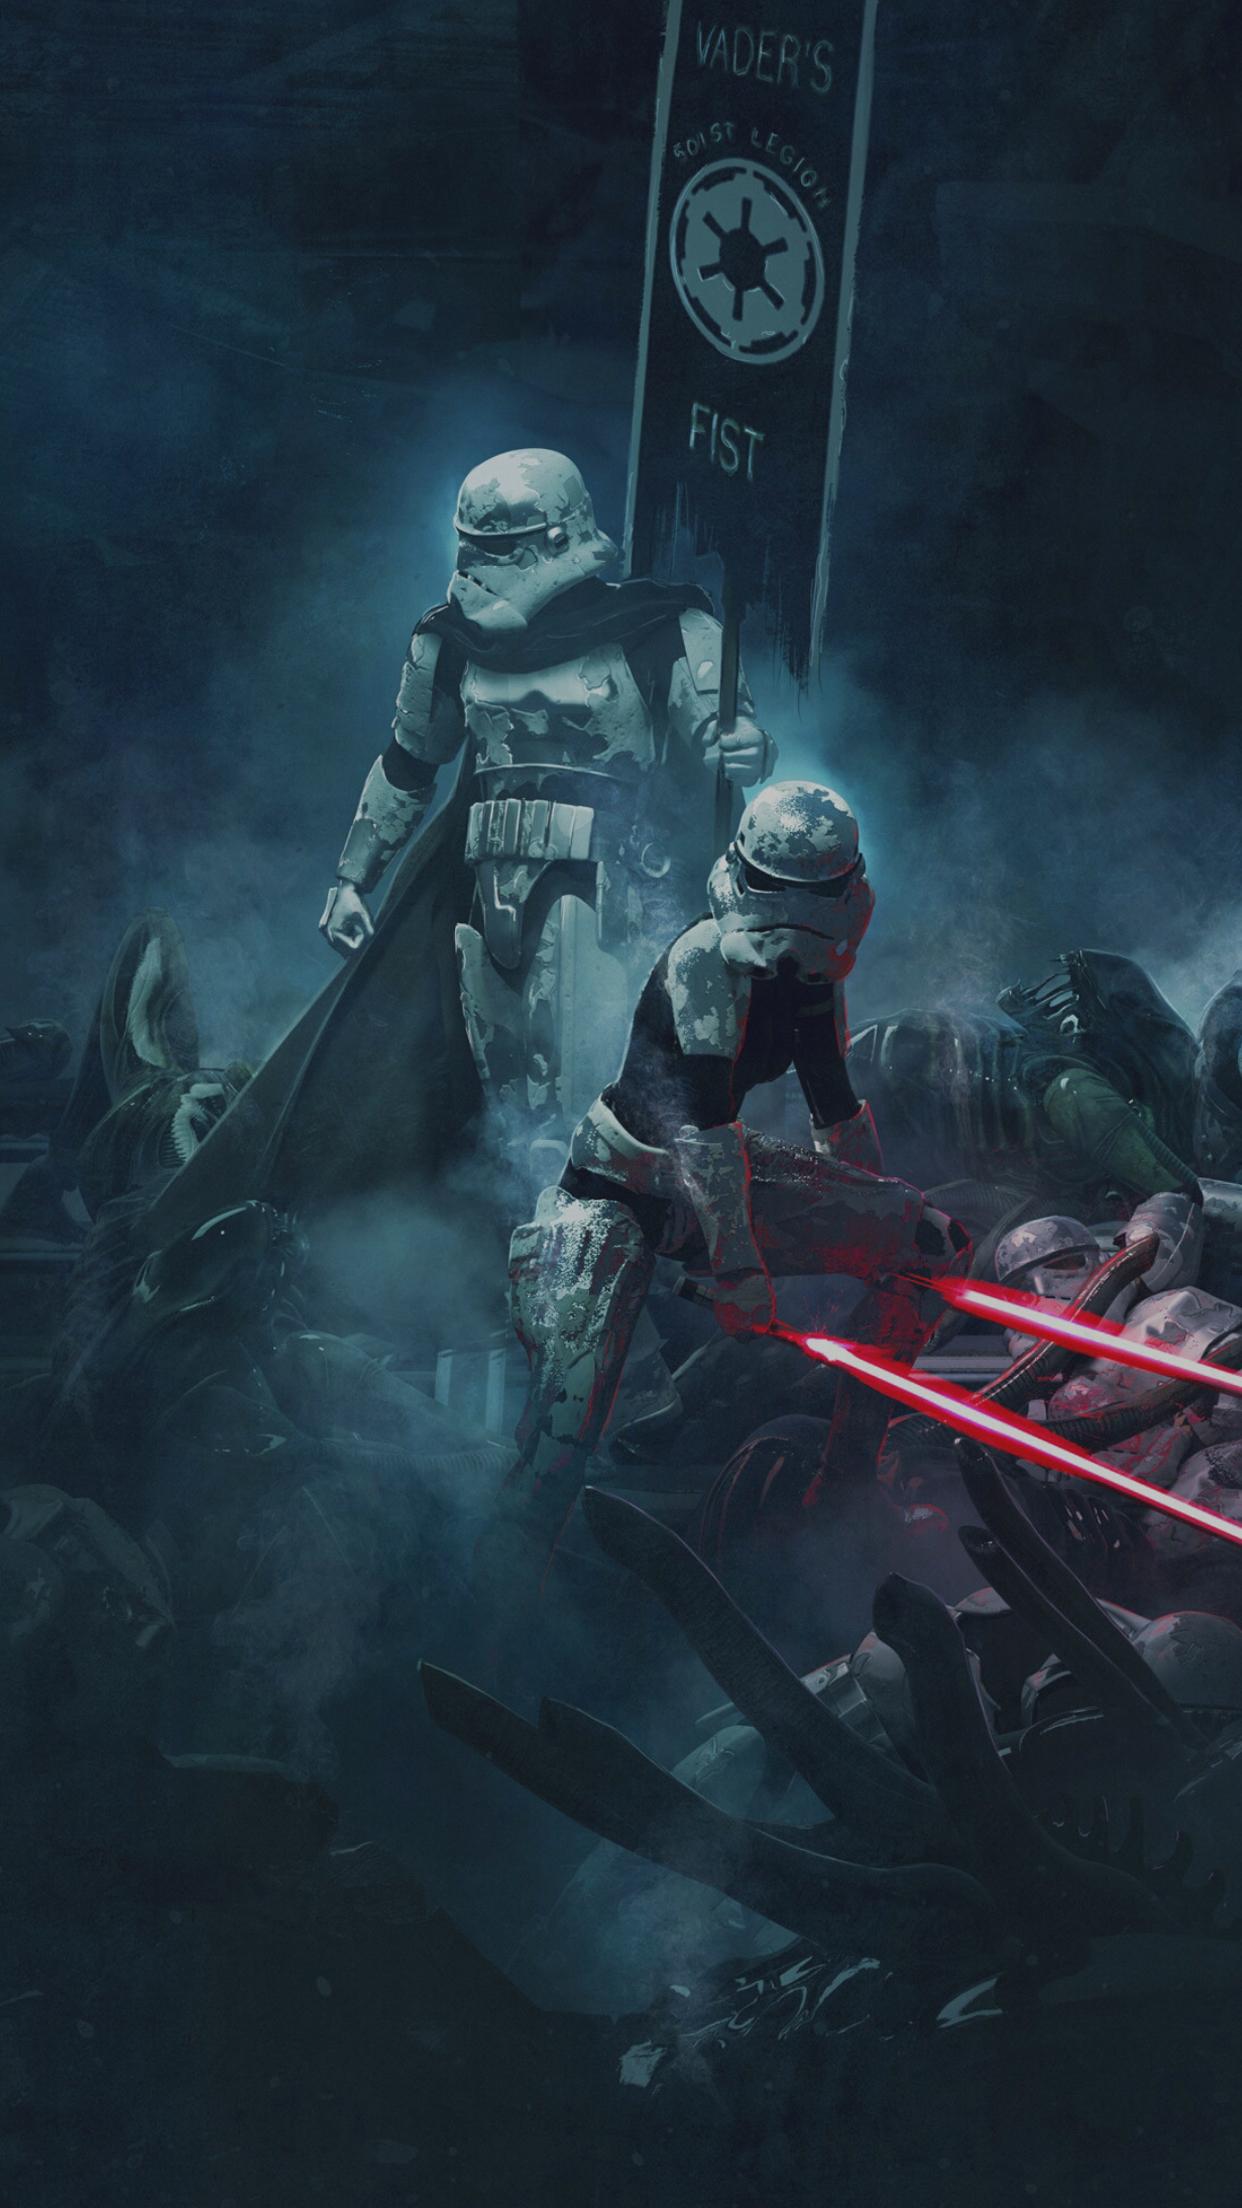 46 Rey Star Wars Wallpaper On Wallpapersafari